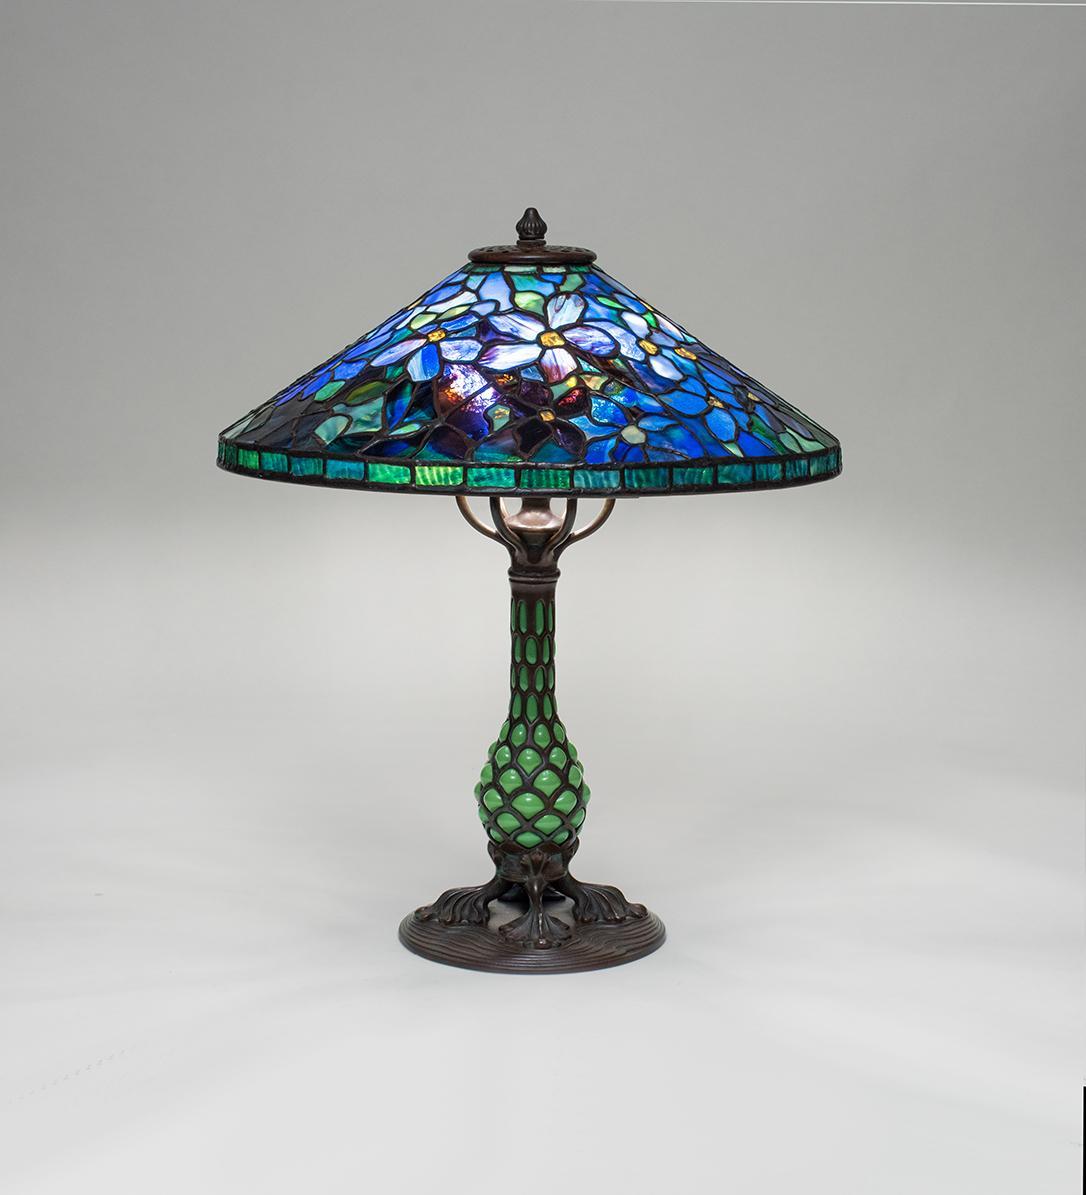 Tiffany Studios Clematis Table Lamp Tiffany Studios Lamps Catalogue Lillian Nassau Llc